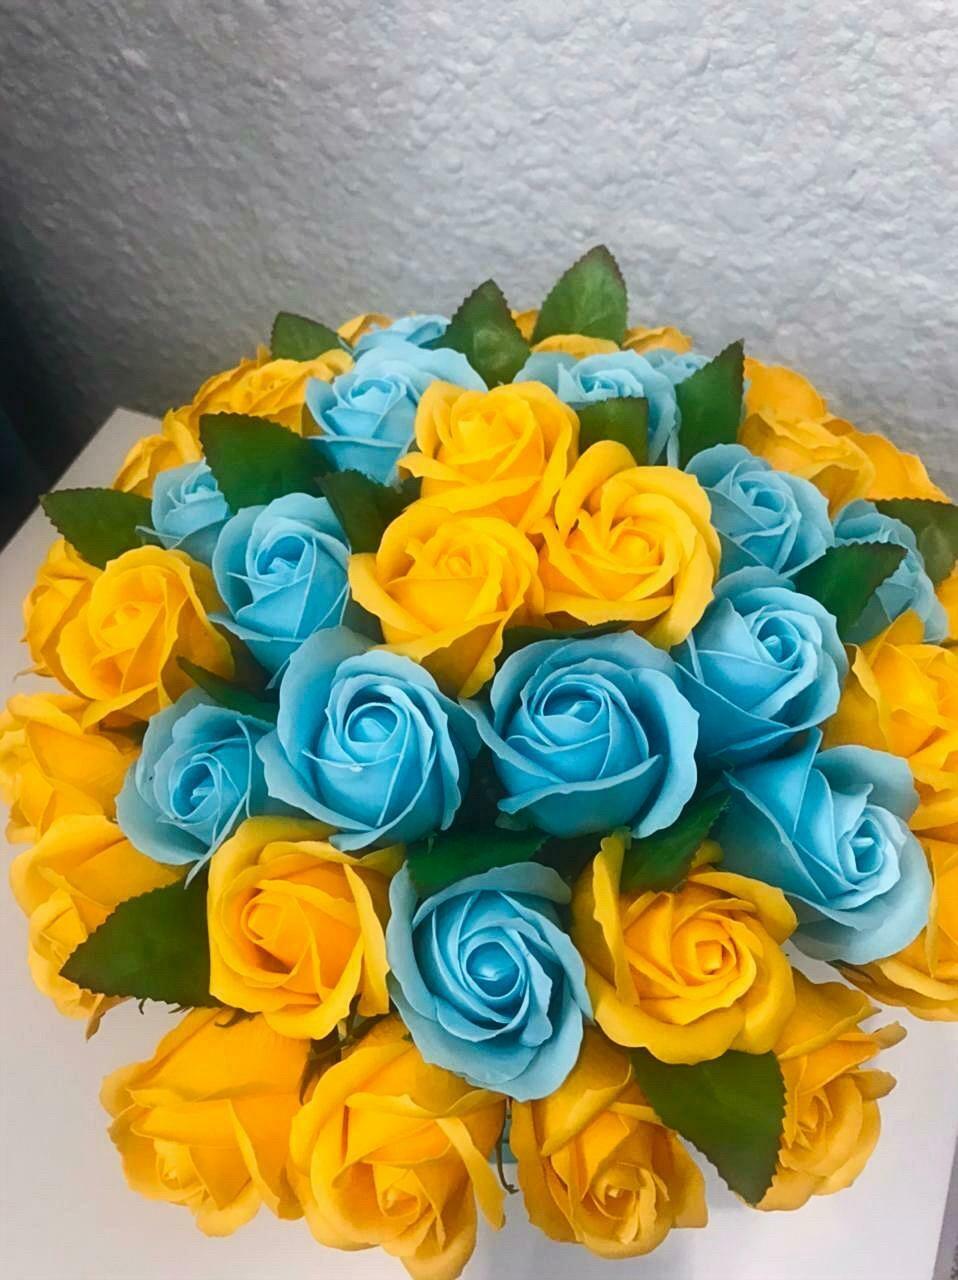 Композиция 41  мыльная роза